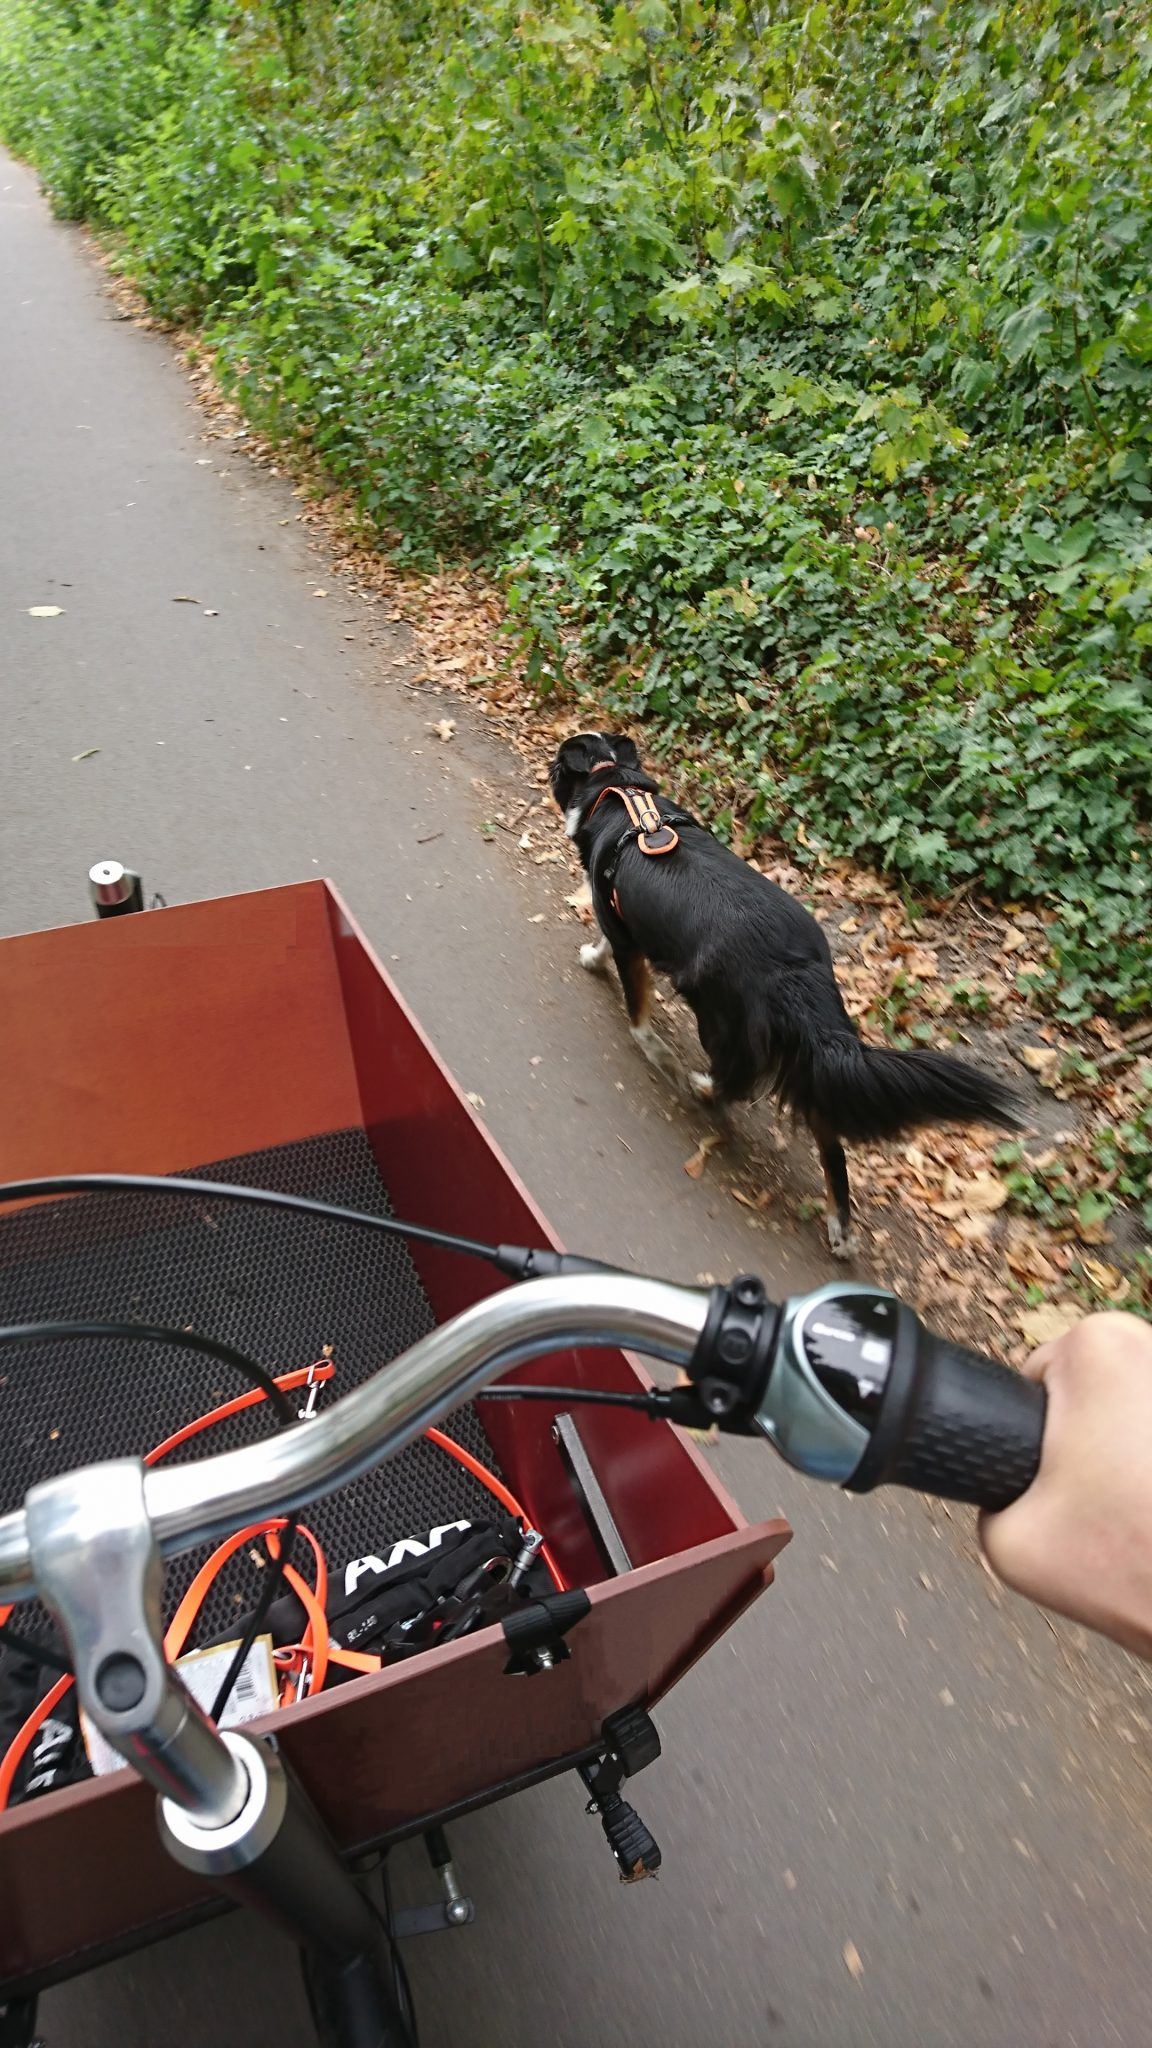 Bakfiets Lastenrad mit Hund